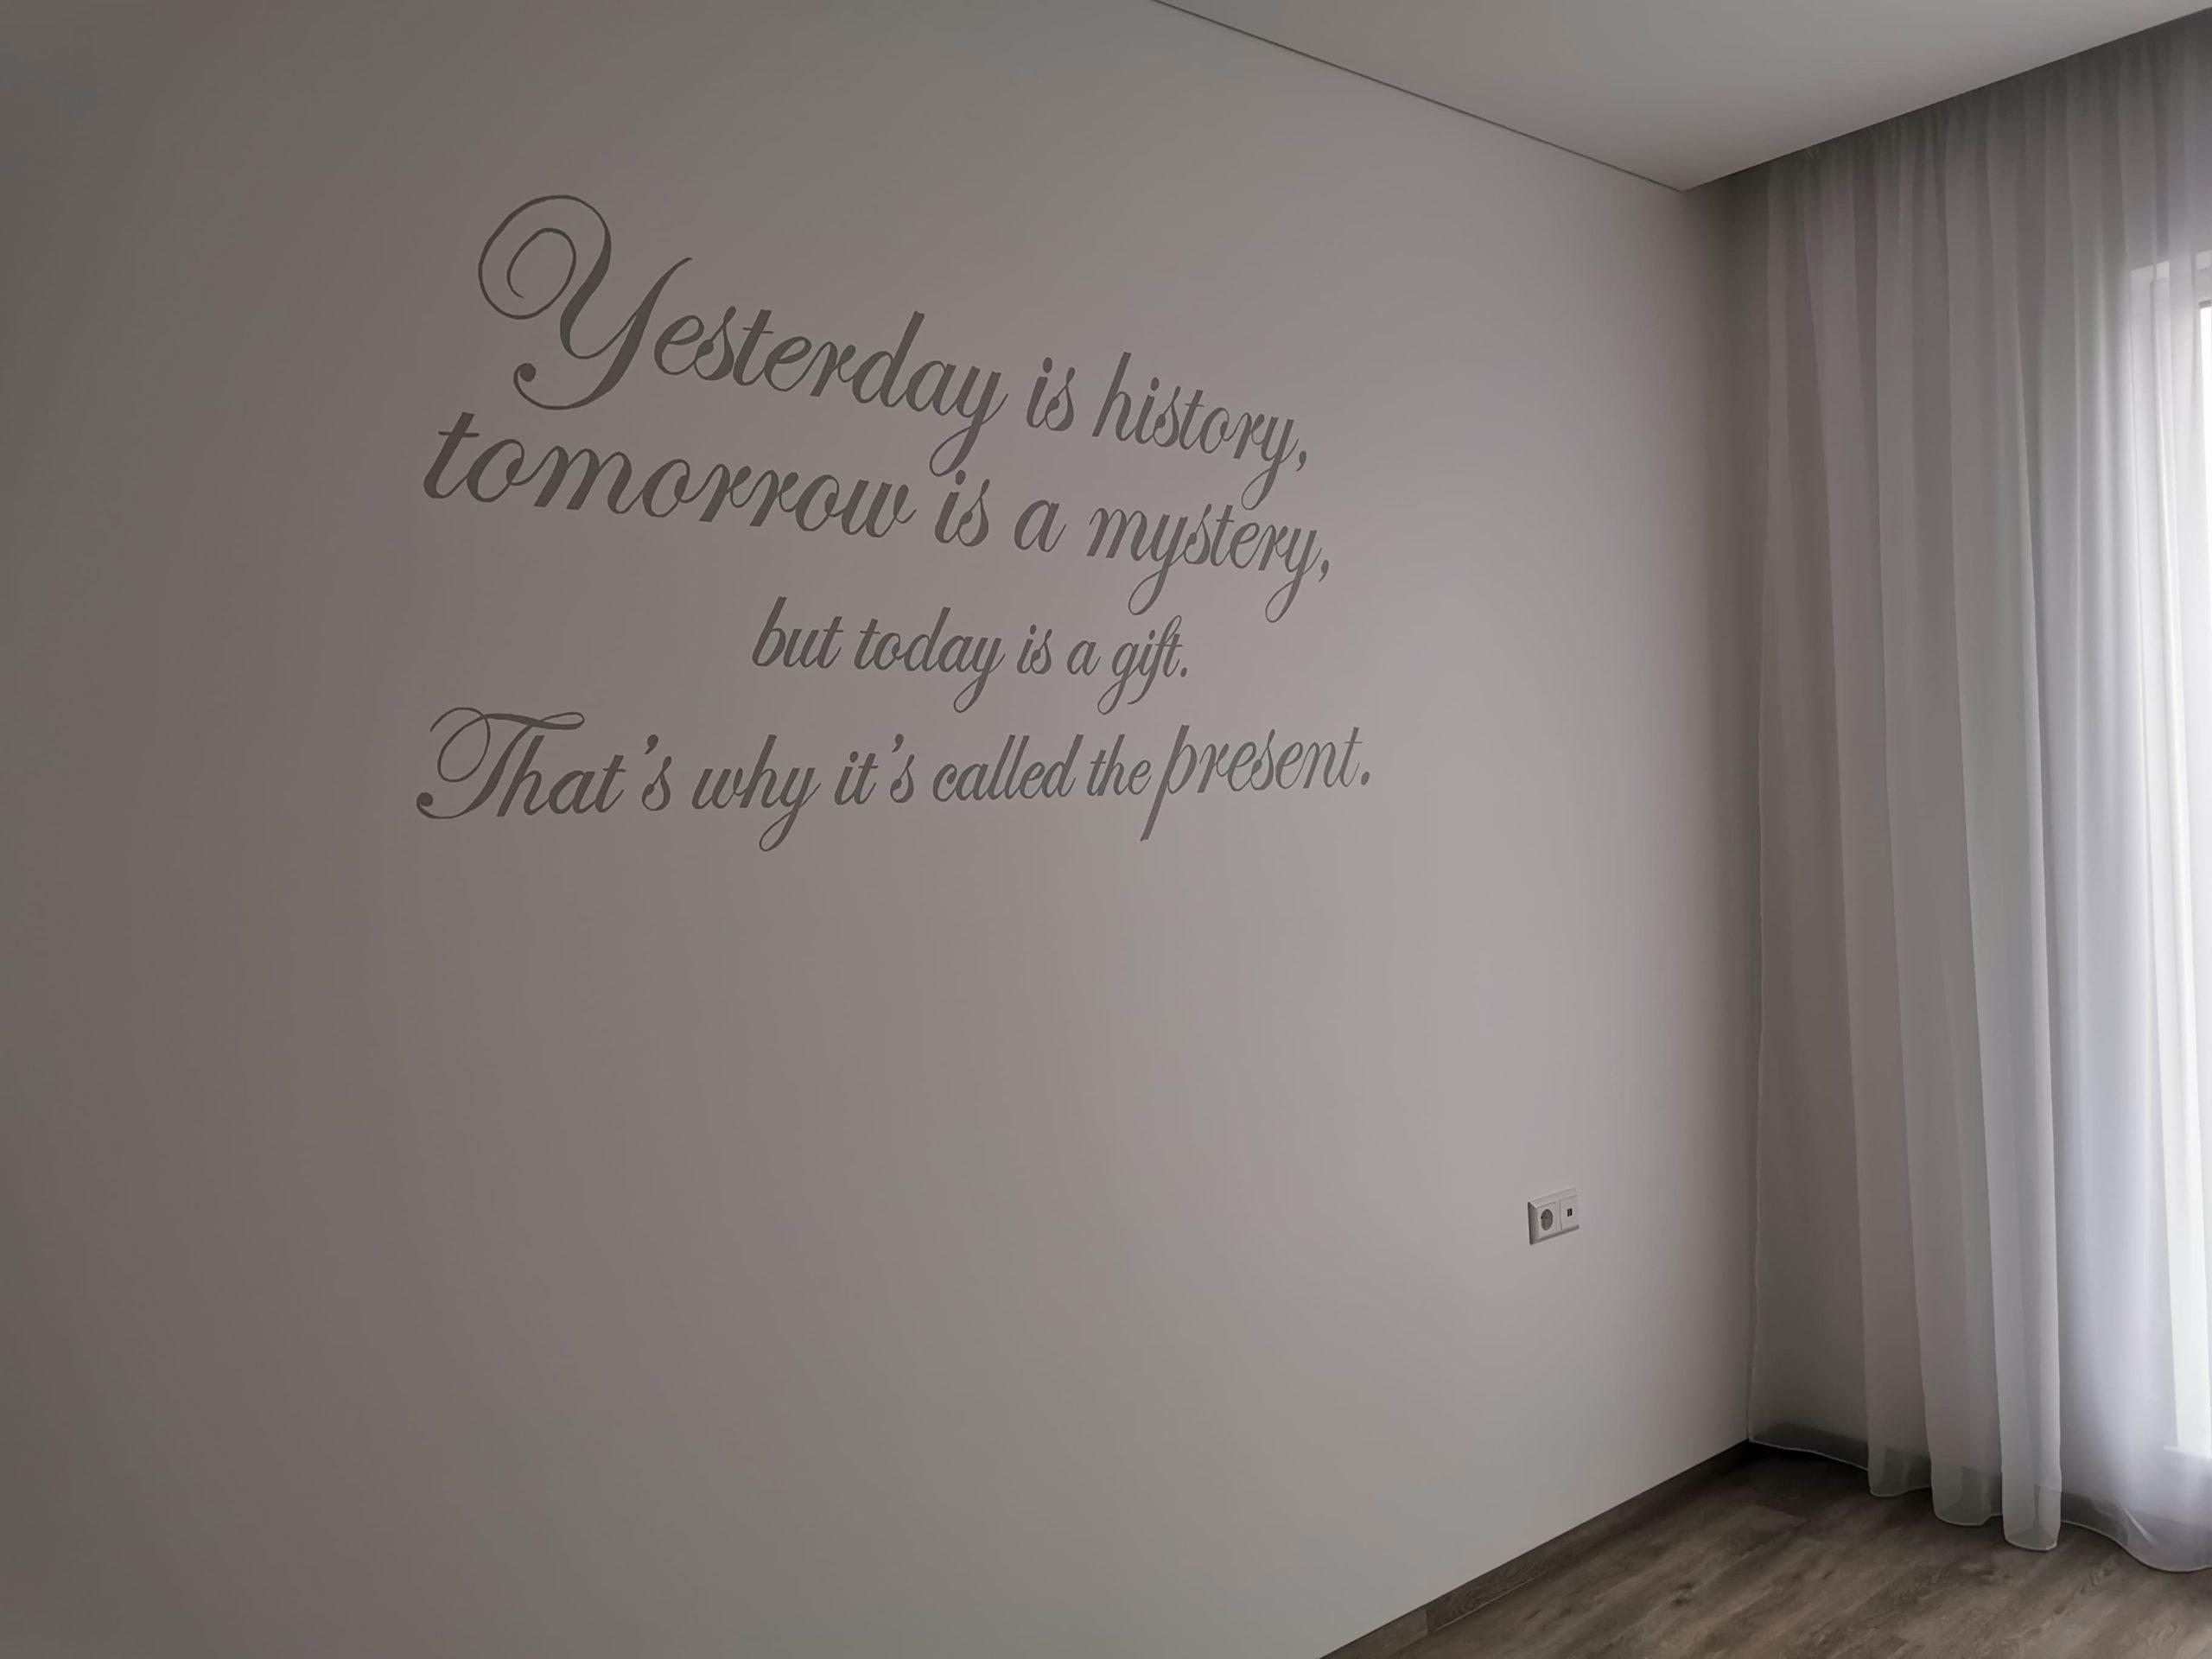 menine-kuryba-sienu-dekoravimas-ivairus-interjerai (23)